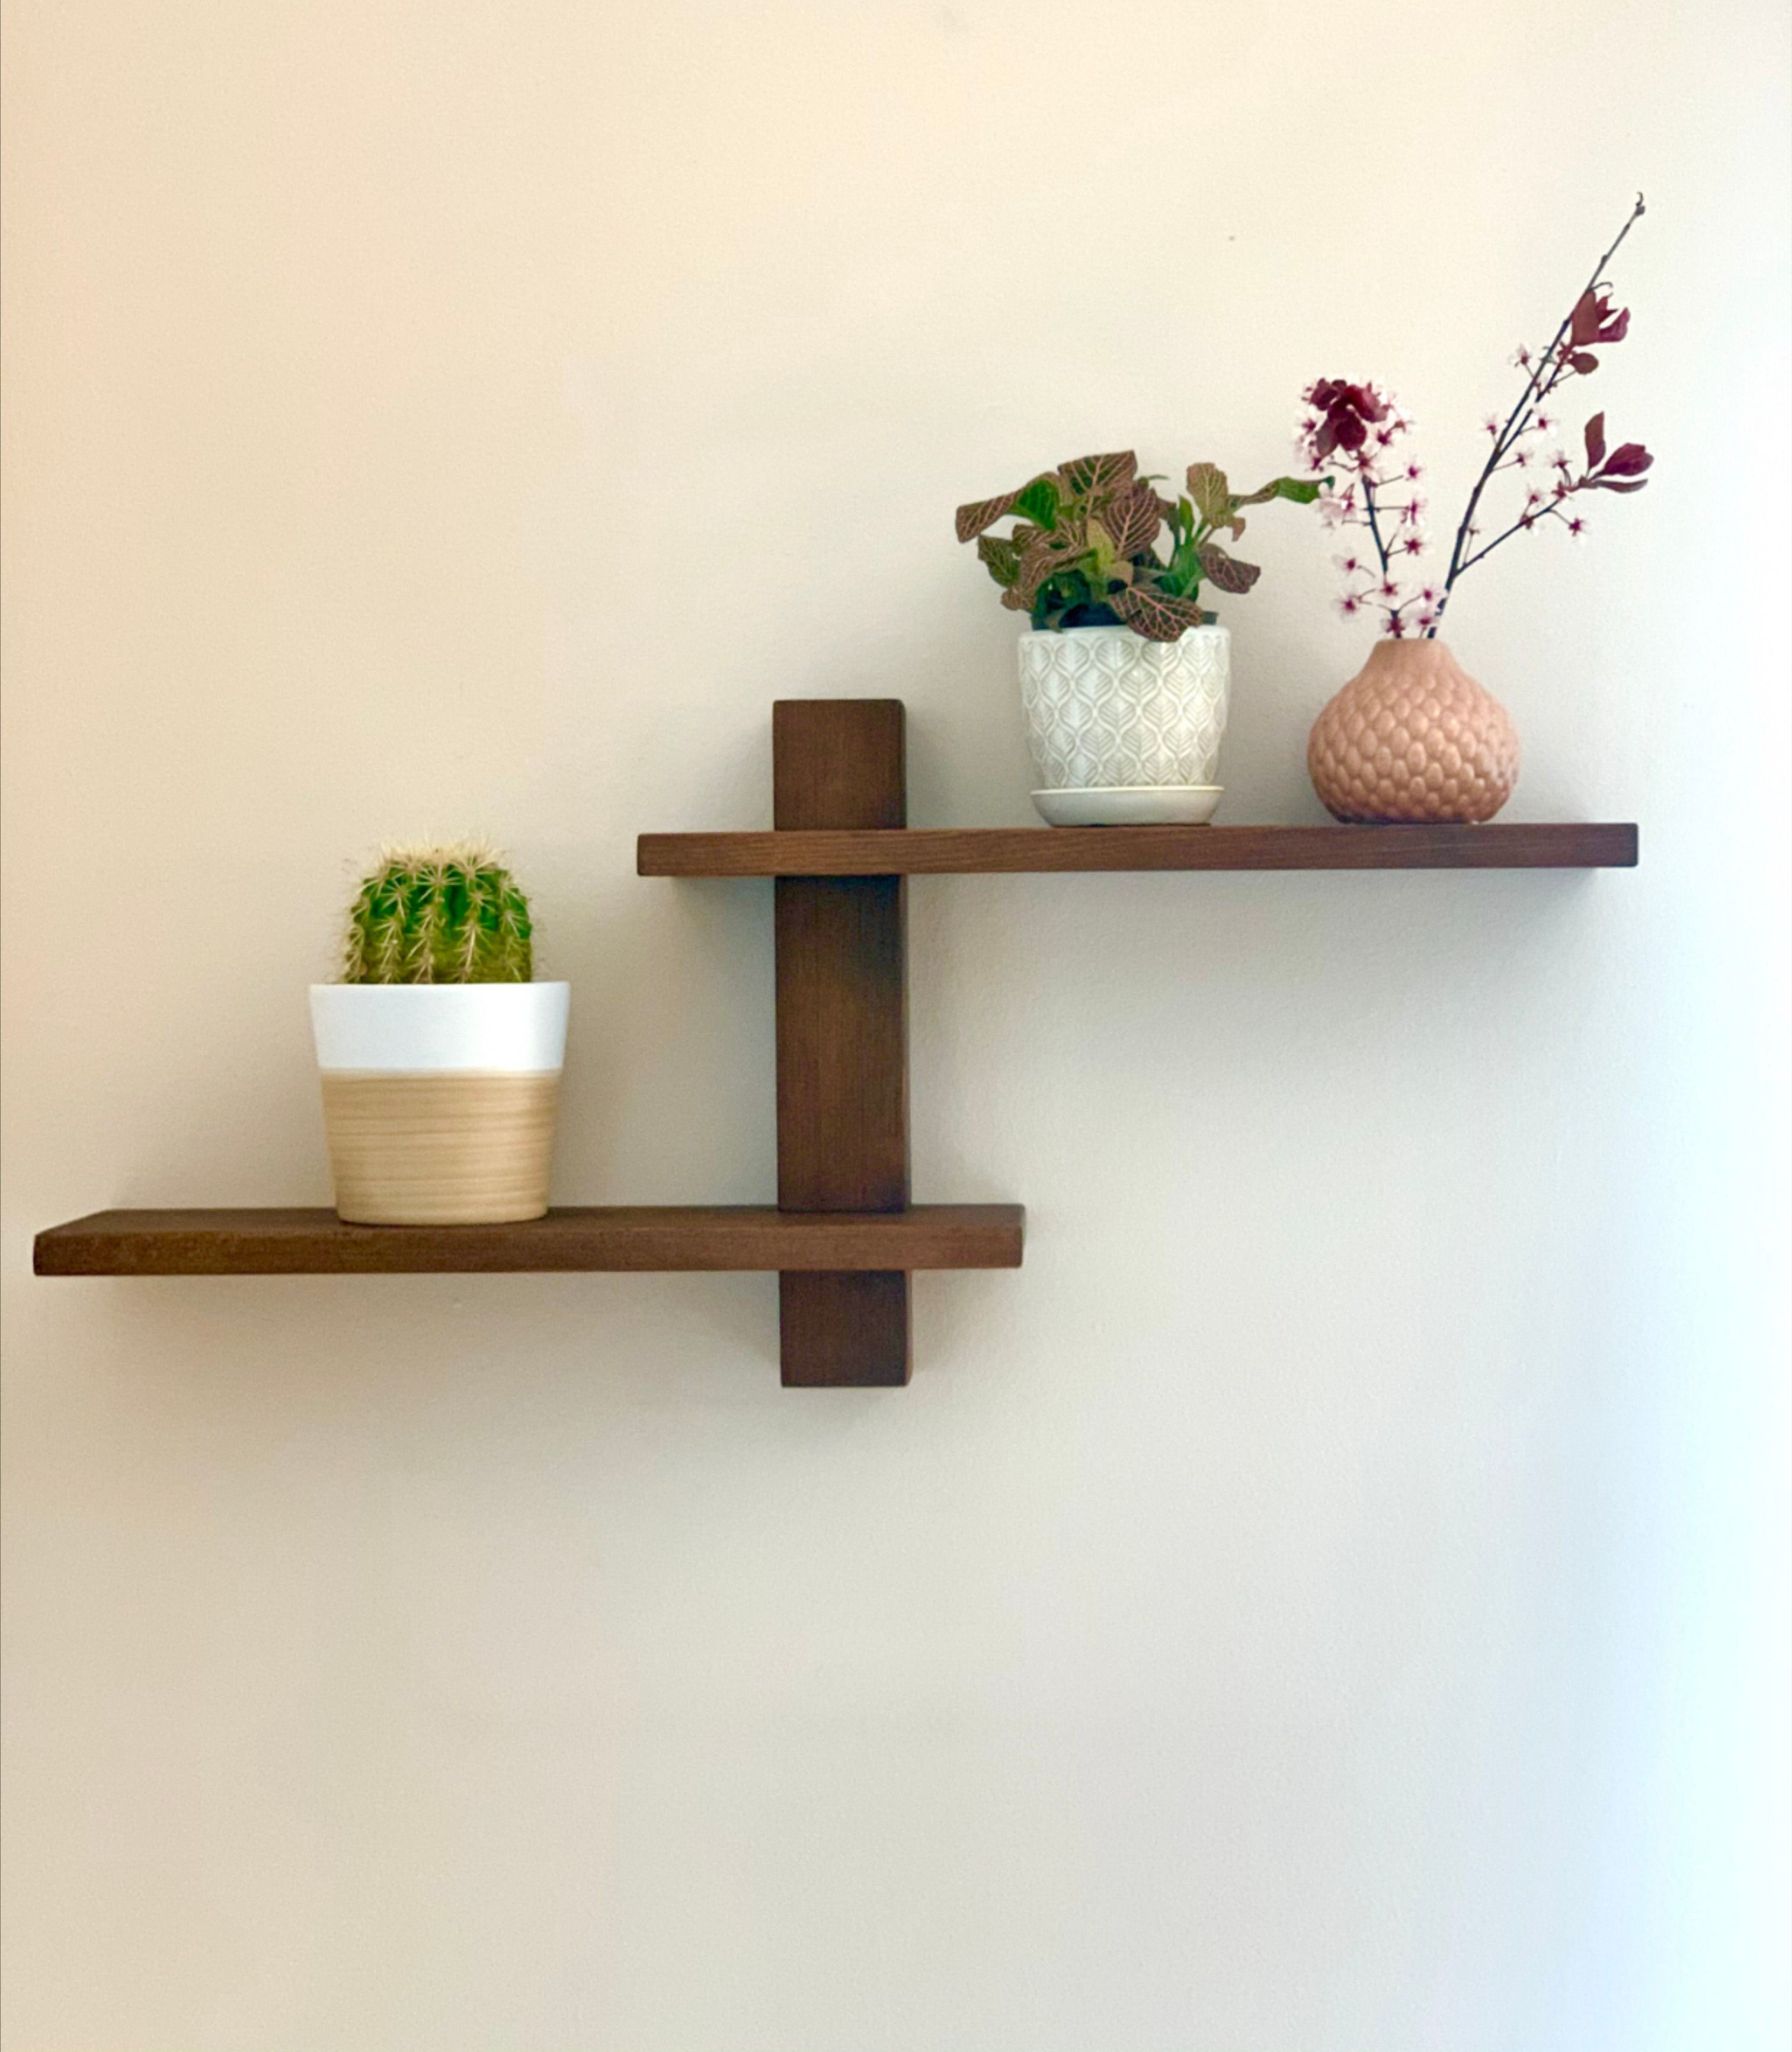 Art Deco Minimalist Wood Hanging Shelves Office Entryway Kitchen Or Bathroom Wall Shelf Mid Century Decor Wedding Housewarming Gift In 2021 Decor Wall Shelves Shelves